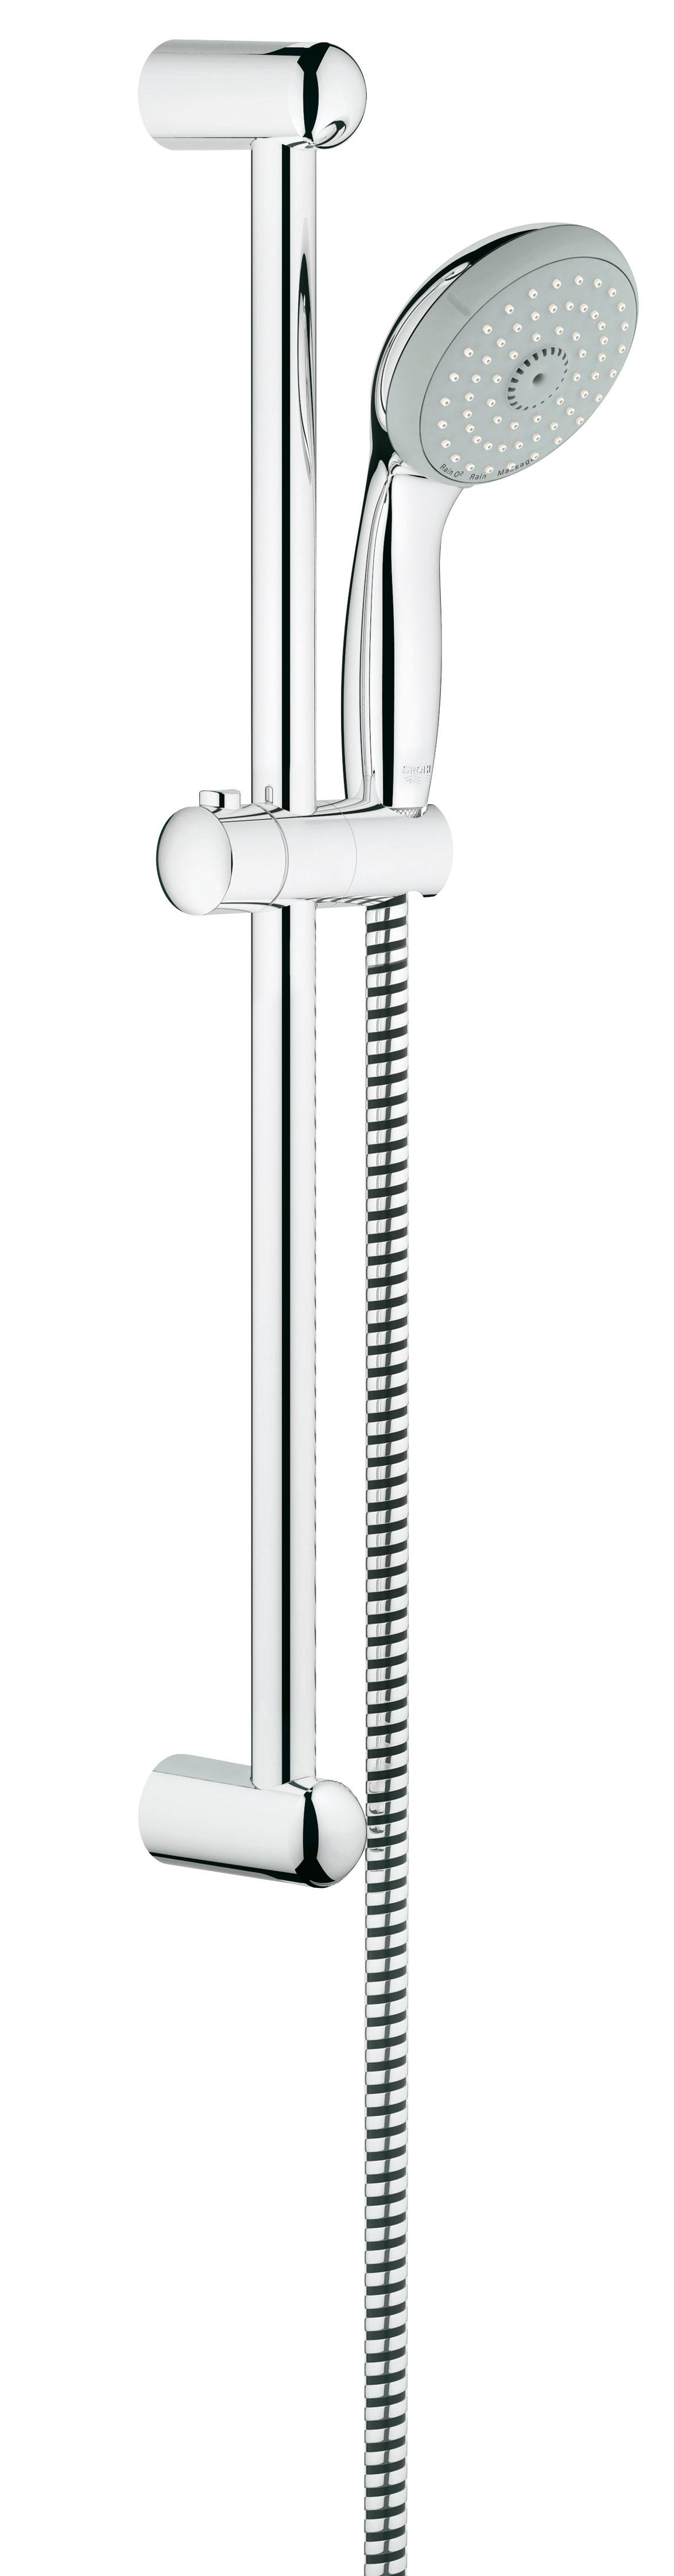 Grohe 27794000 Tempesta Classic (ручной душ, штанга 600 мм, шланг 1750 мм), хром